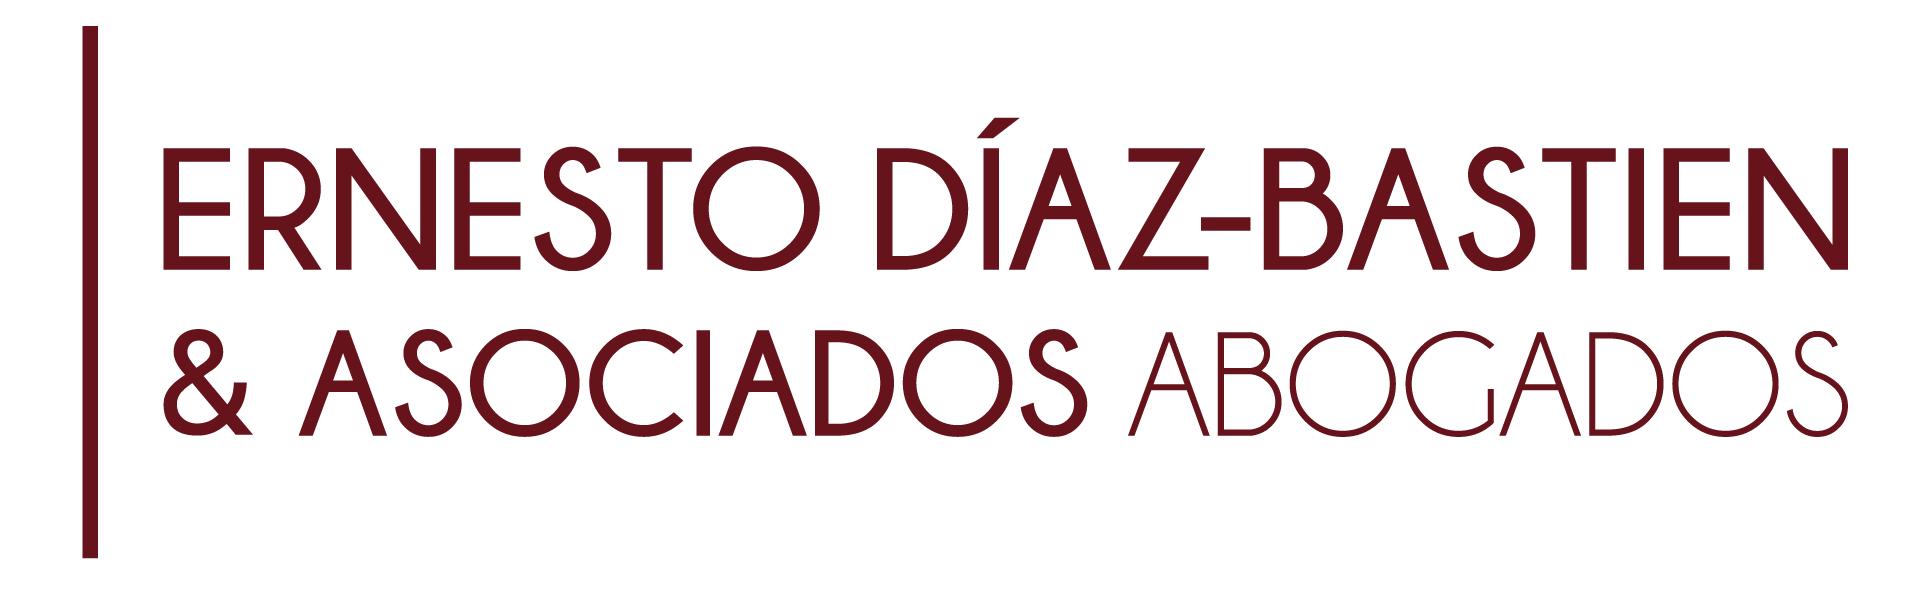 ERNESTO DÍAZ-BASTIEN & ASOCIADOS